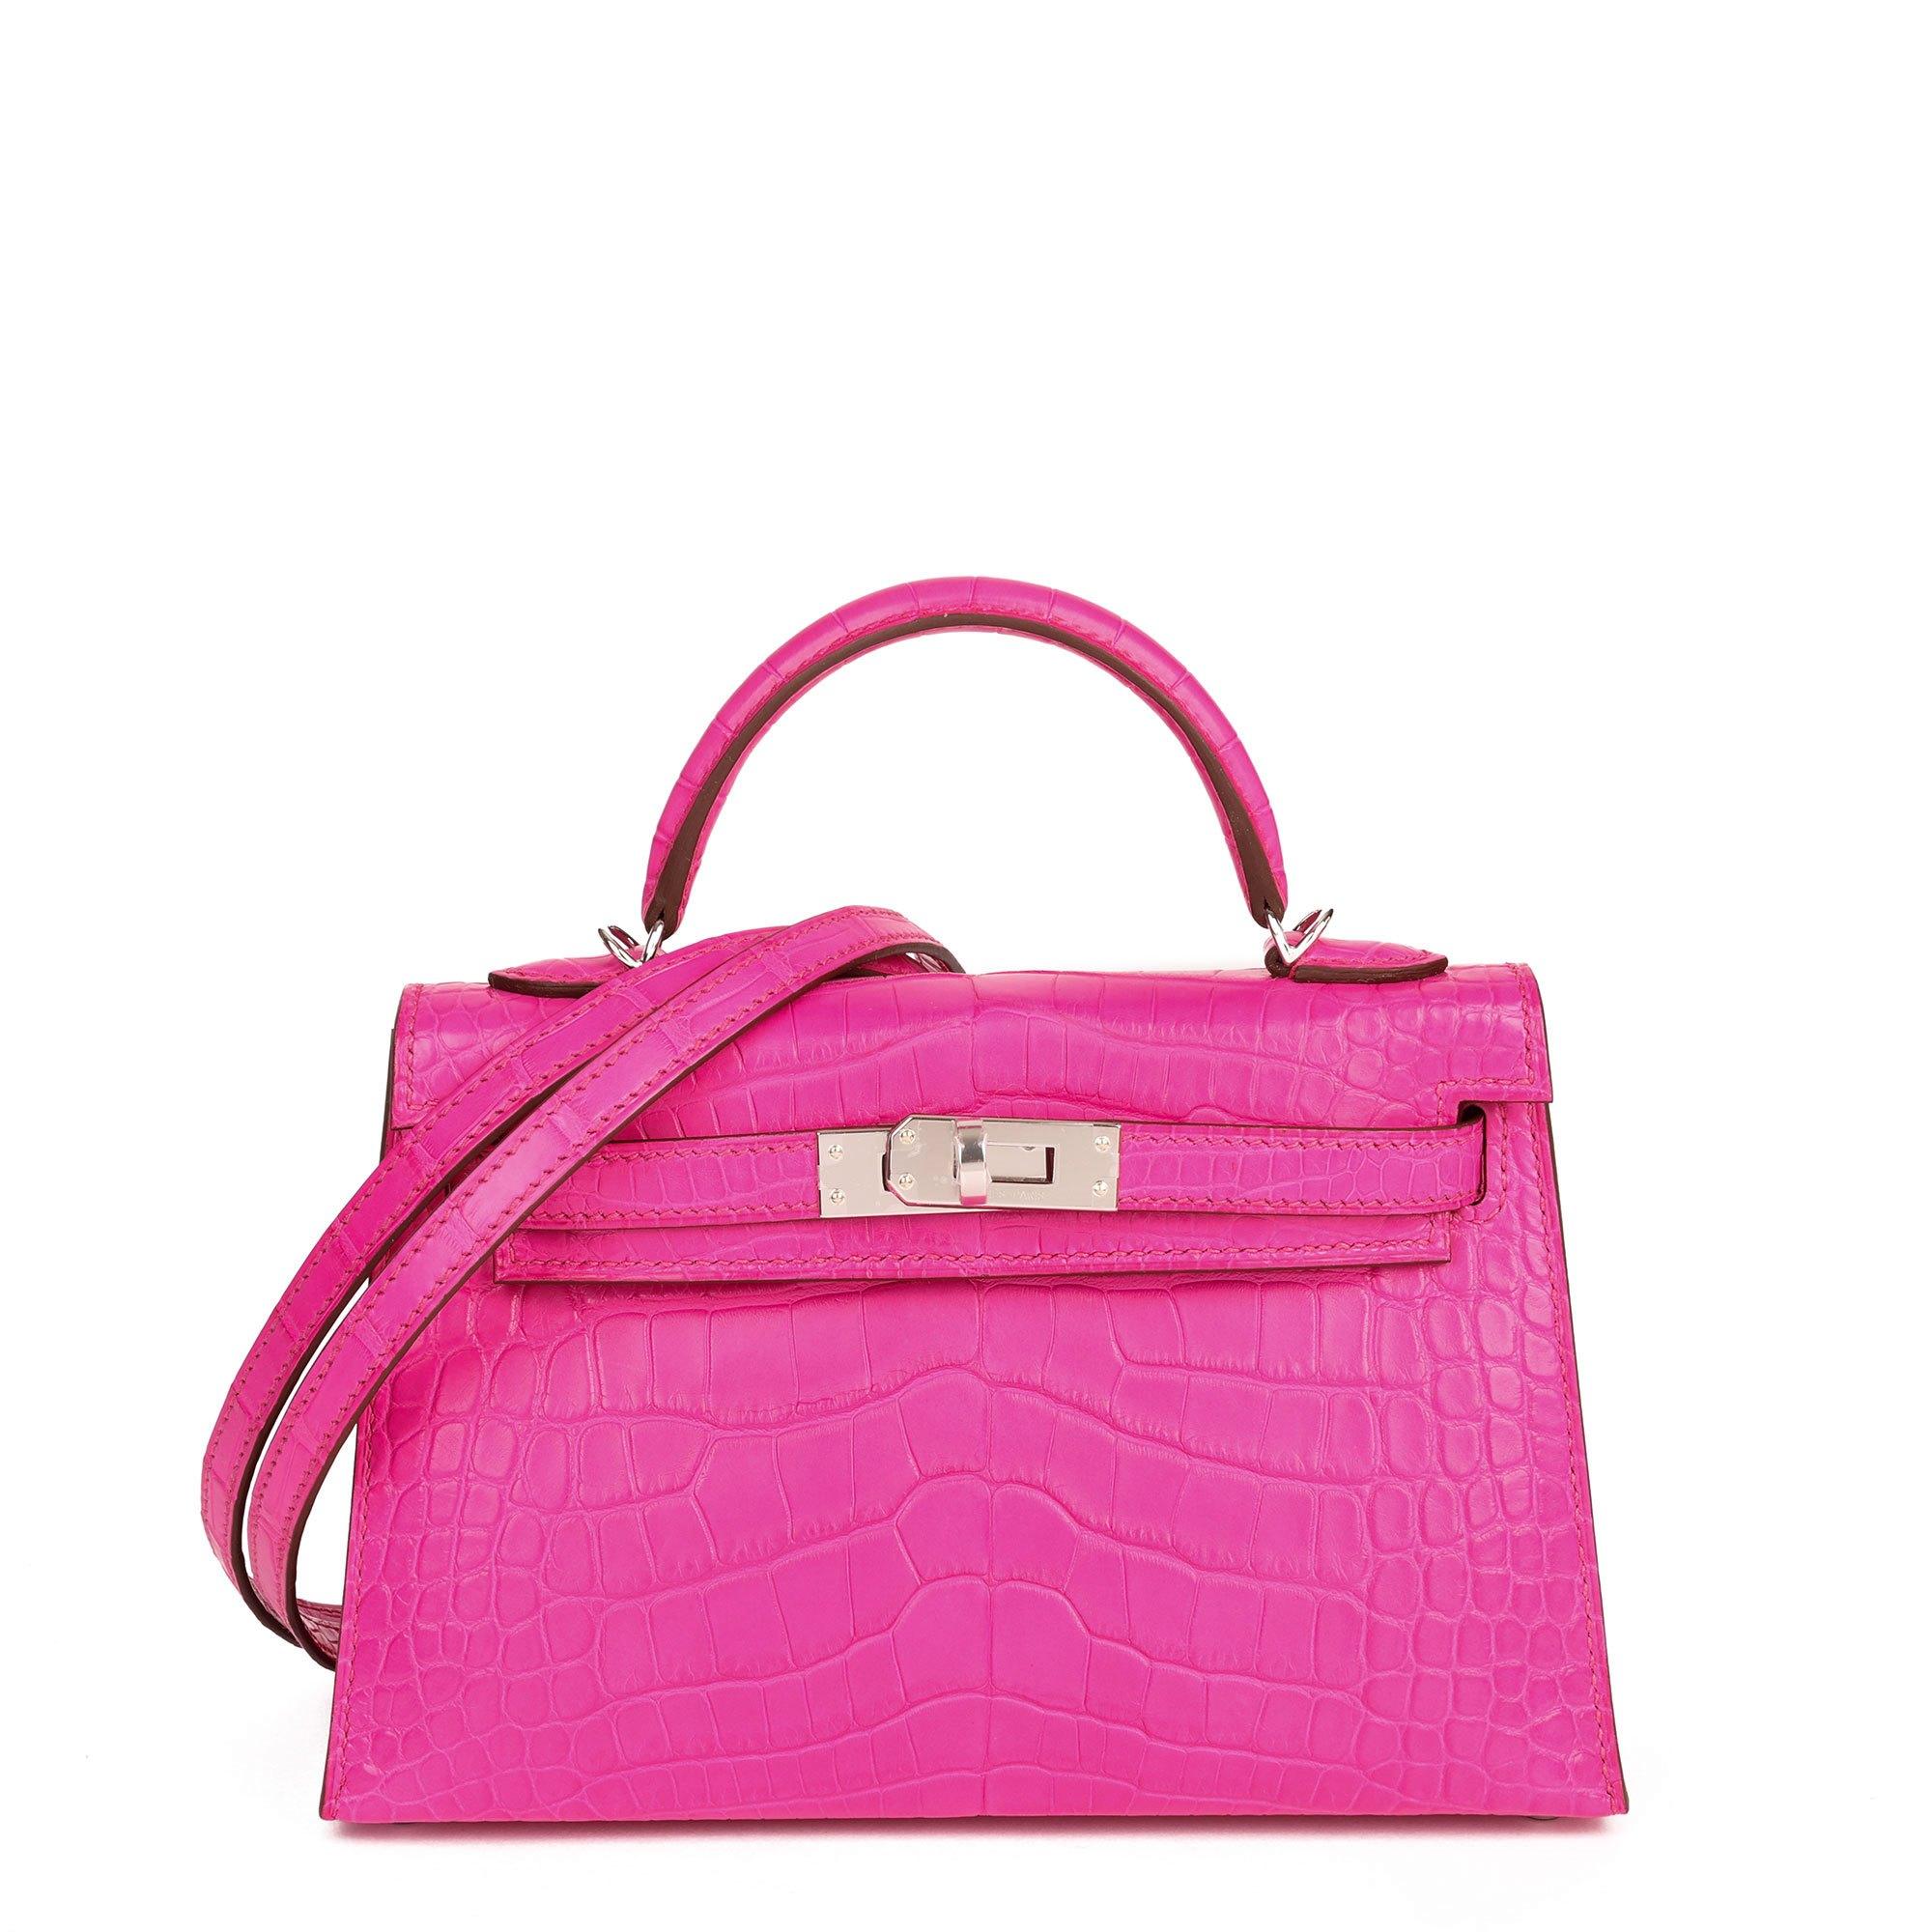 Hermès Rose Shocking Matte Alligator Leather Kelly 20cm II Sellier